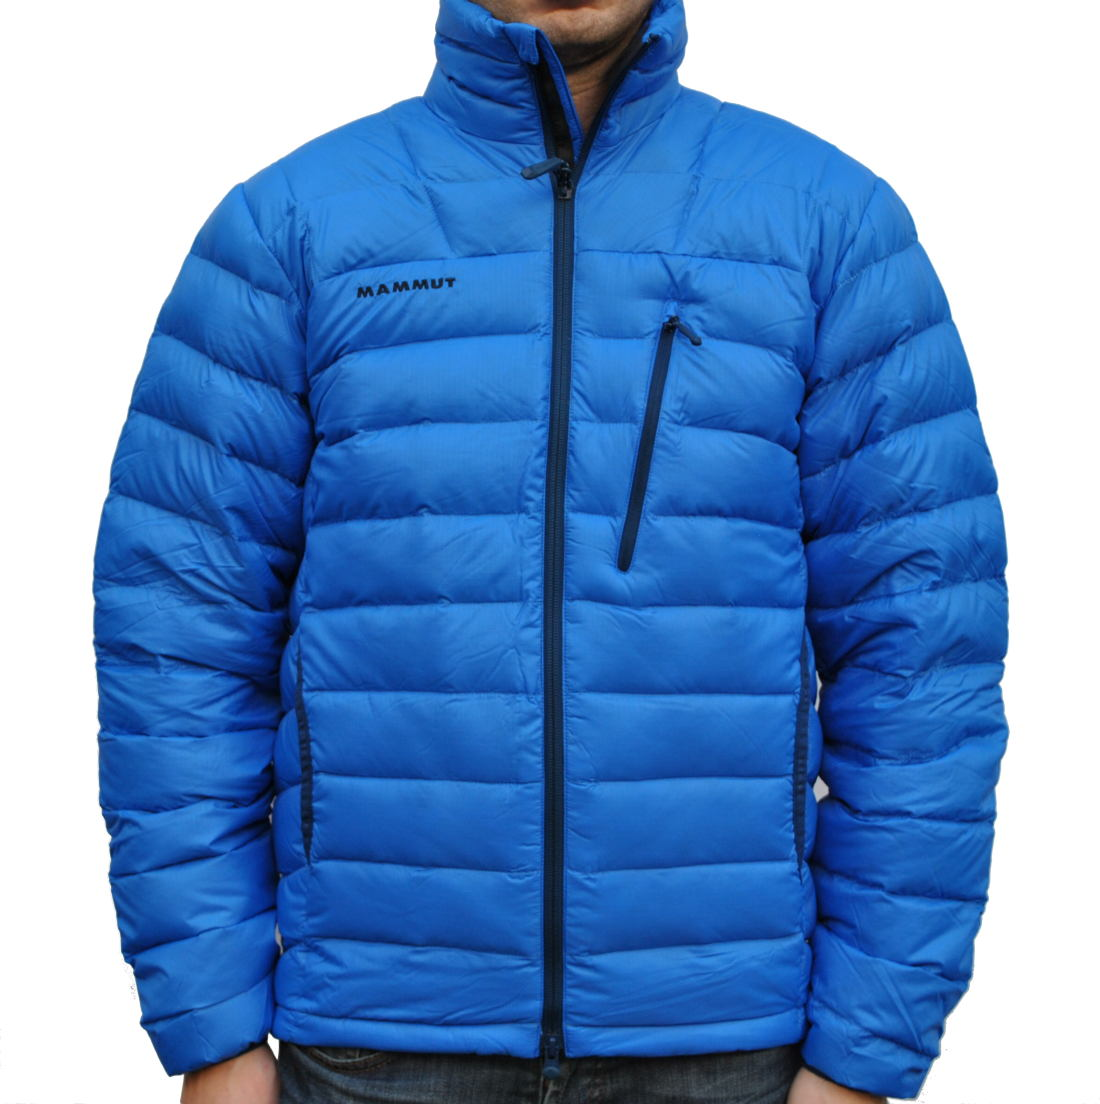 mammut broad peak ii jacke winterjacke daunenjacke herren schwarz gr n blau ebay. Black Bedroom Furniture Sets. Home Design Ideas